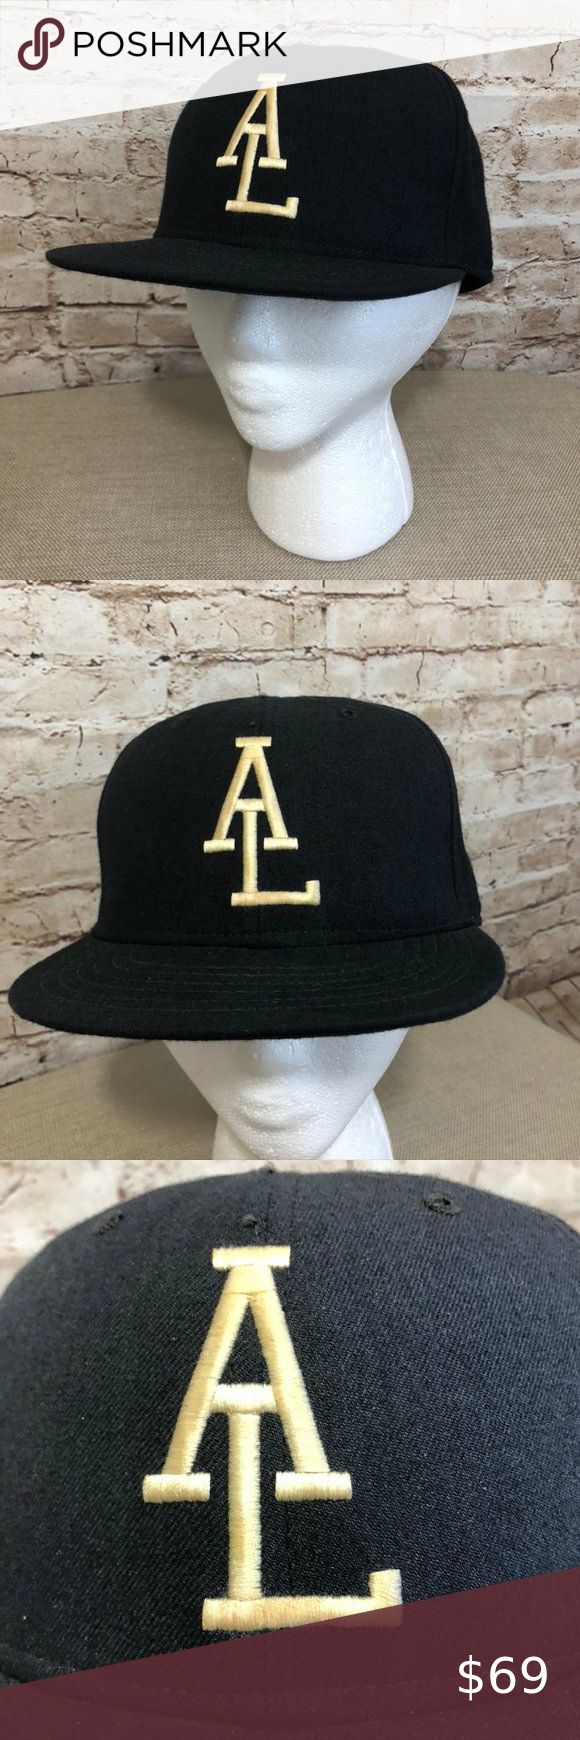 Vtg New Era Umpire Mlb Hat Baseball Cap 80s Vintage New Era American Major League Baseball Umpire Cap Hat Mlb 80s Usa Fitted In 2020 Baseball Hats Fitted Hats New Era